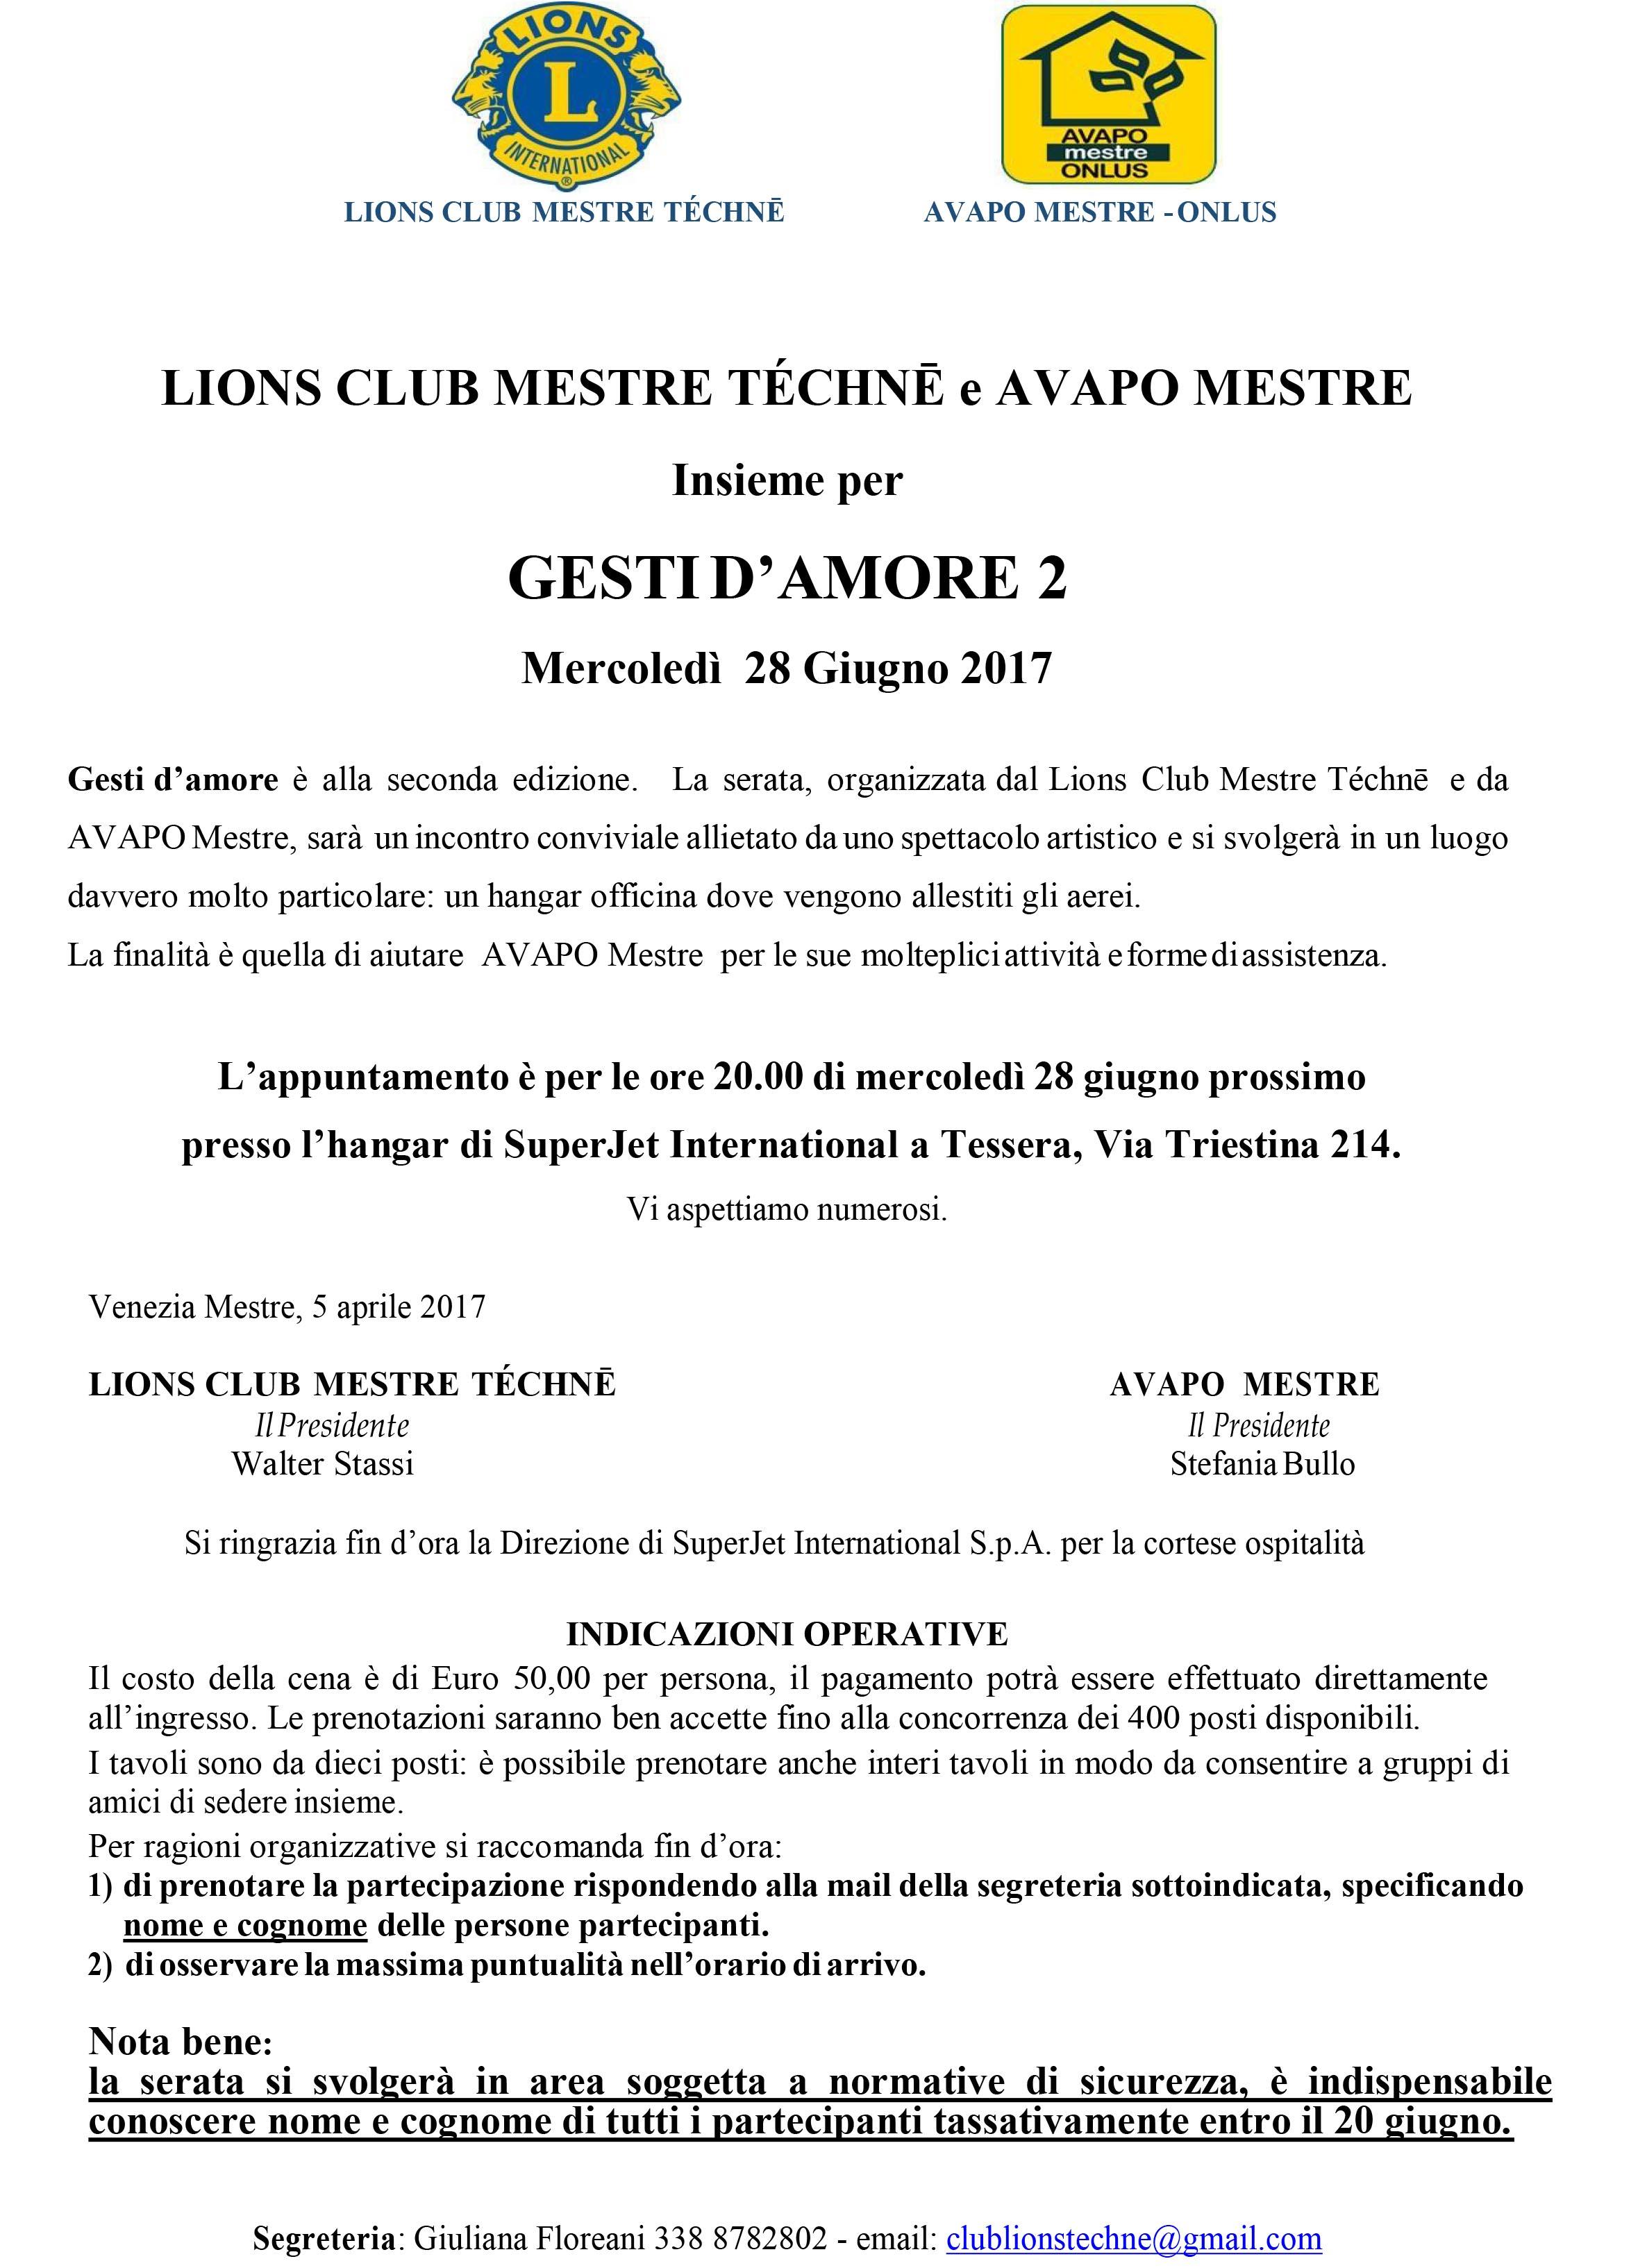 GESTIDAMORE2